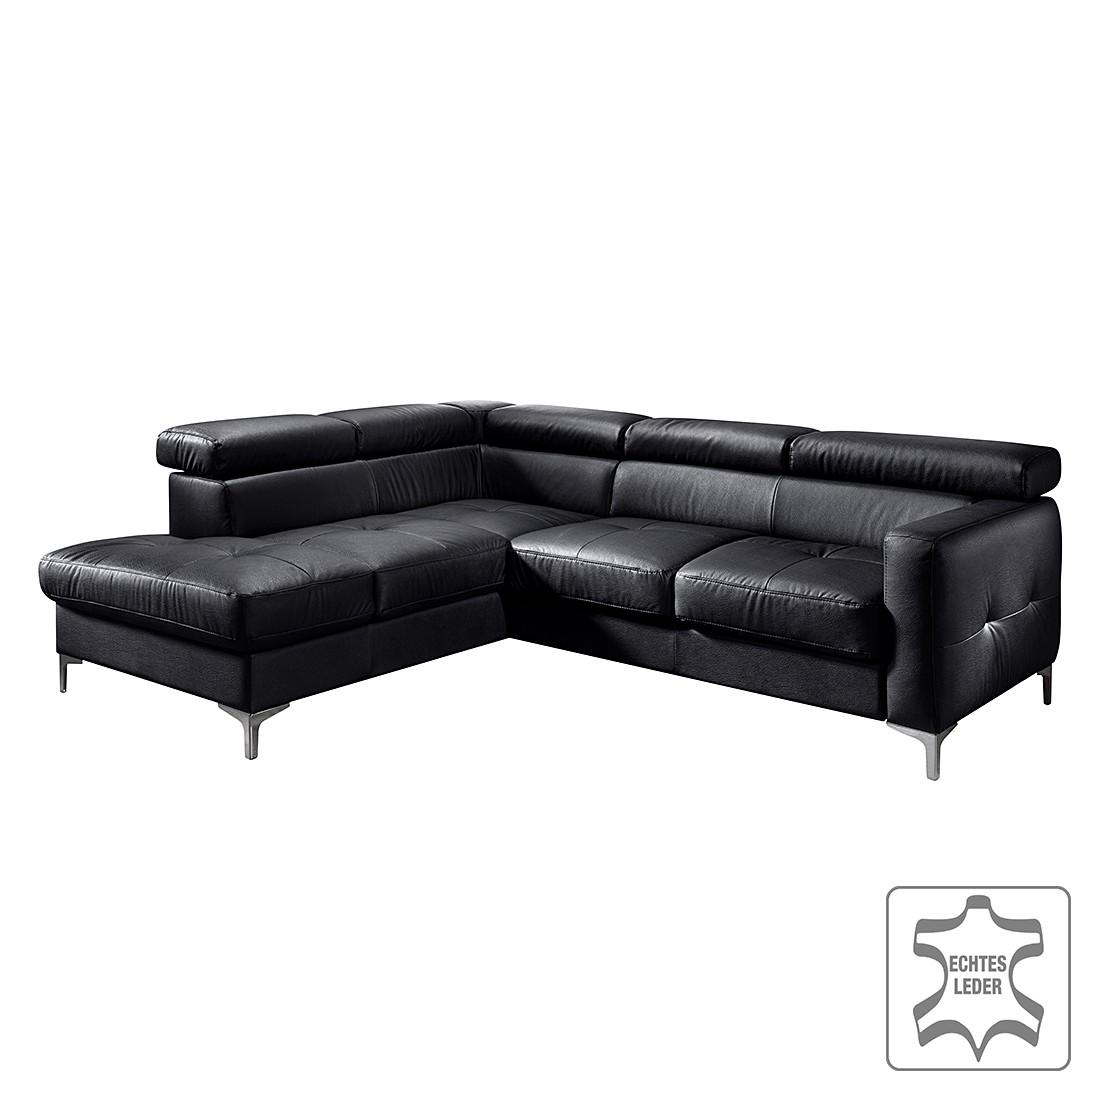 ecksofa eduardo mit schlaffunktion echtleder schwarz ottomane davorstehend links ohne. Black Bedroom Furniture Sets. Home Design Ideas